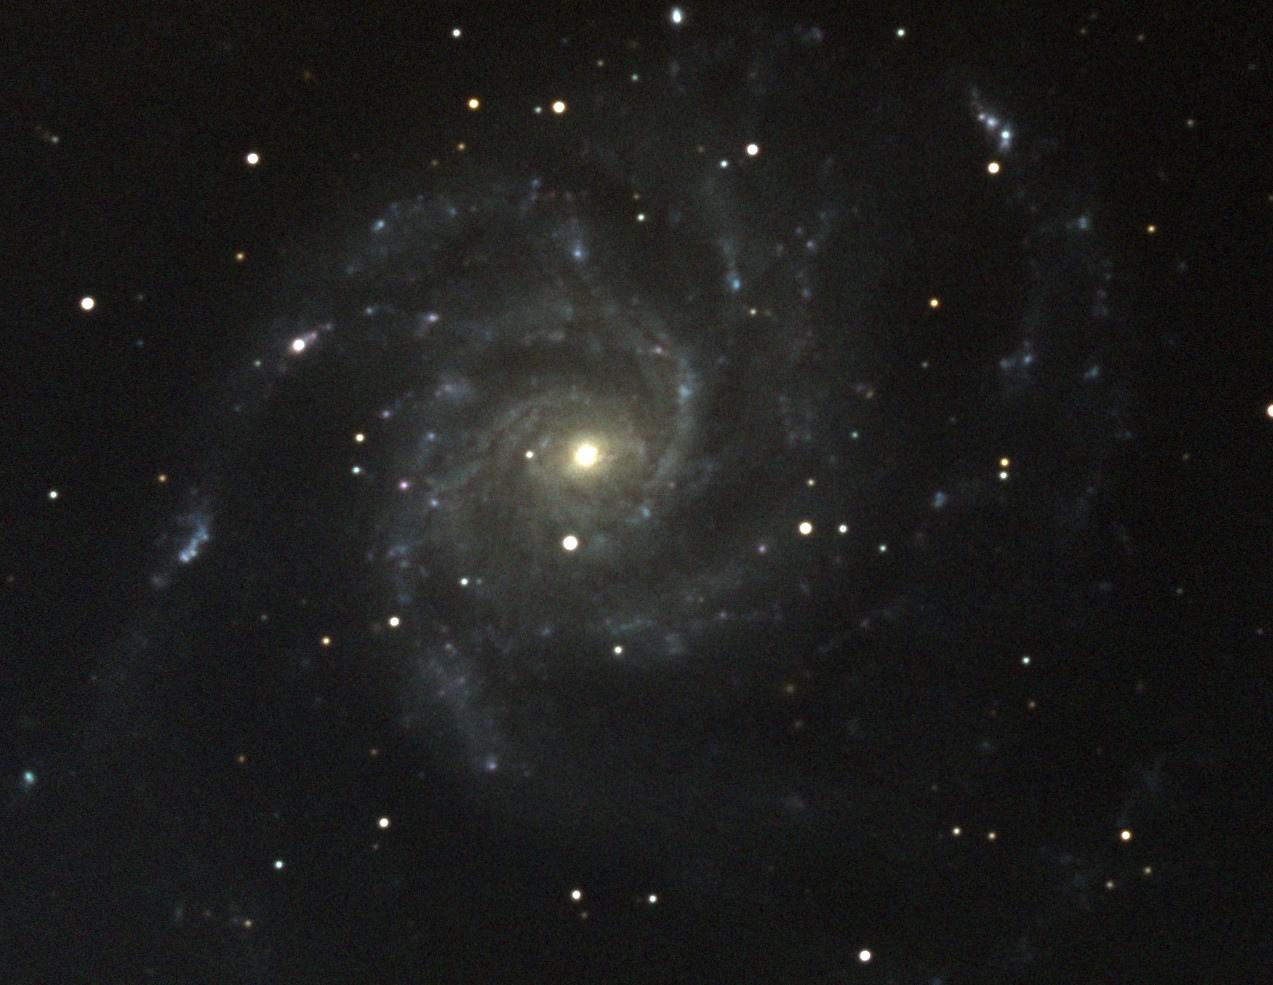 M101-H@RVB.jpg.e4aa960f06f2355bc47afa728cef3b4c.jpg